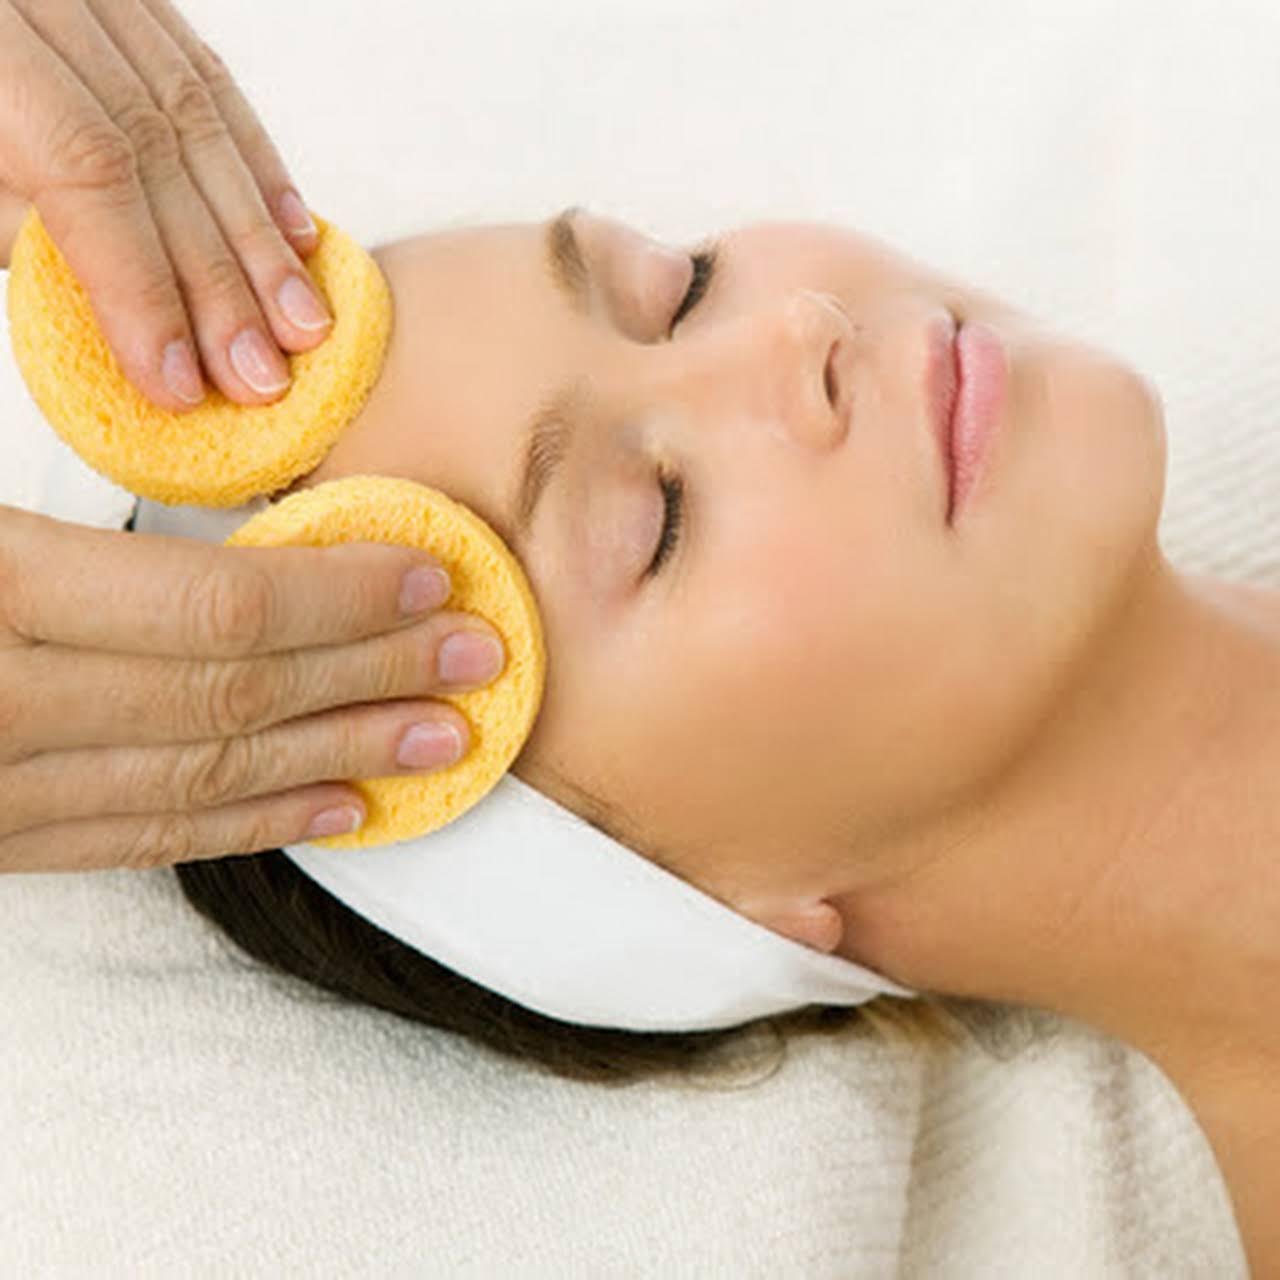 BEST BROW - Eyebrow threading and facial spa  - EYEBROW THREADING